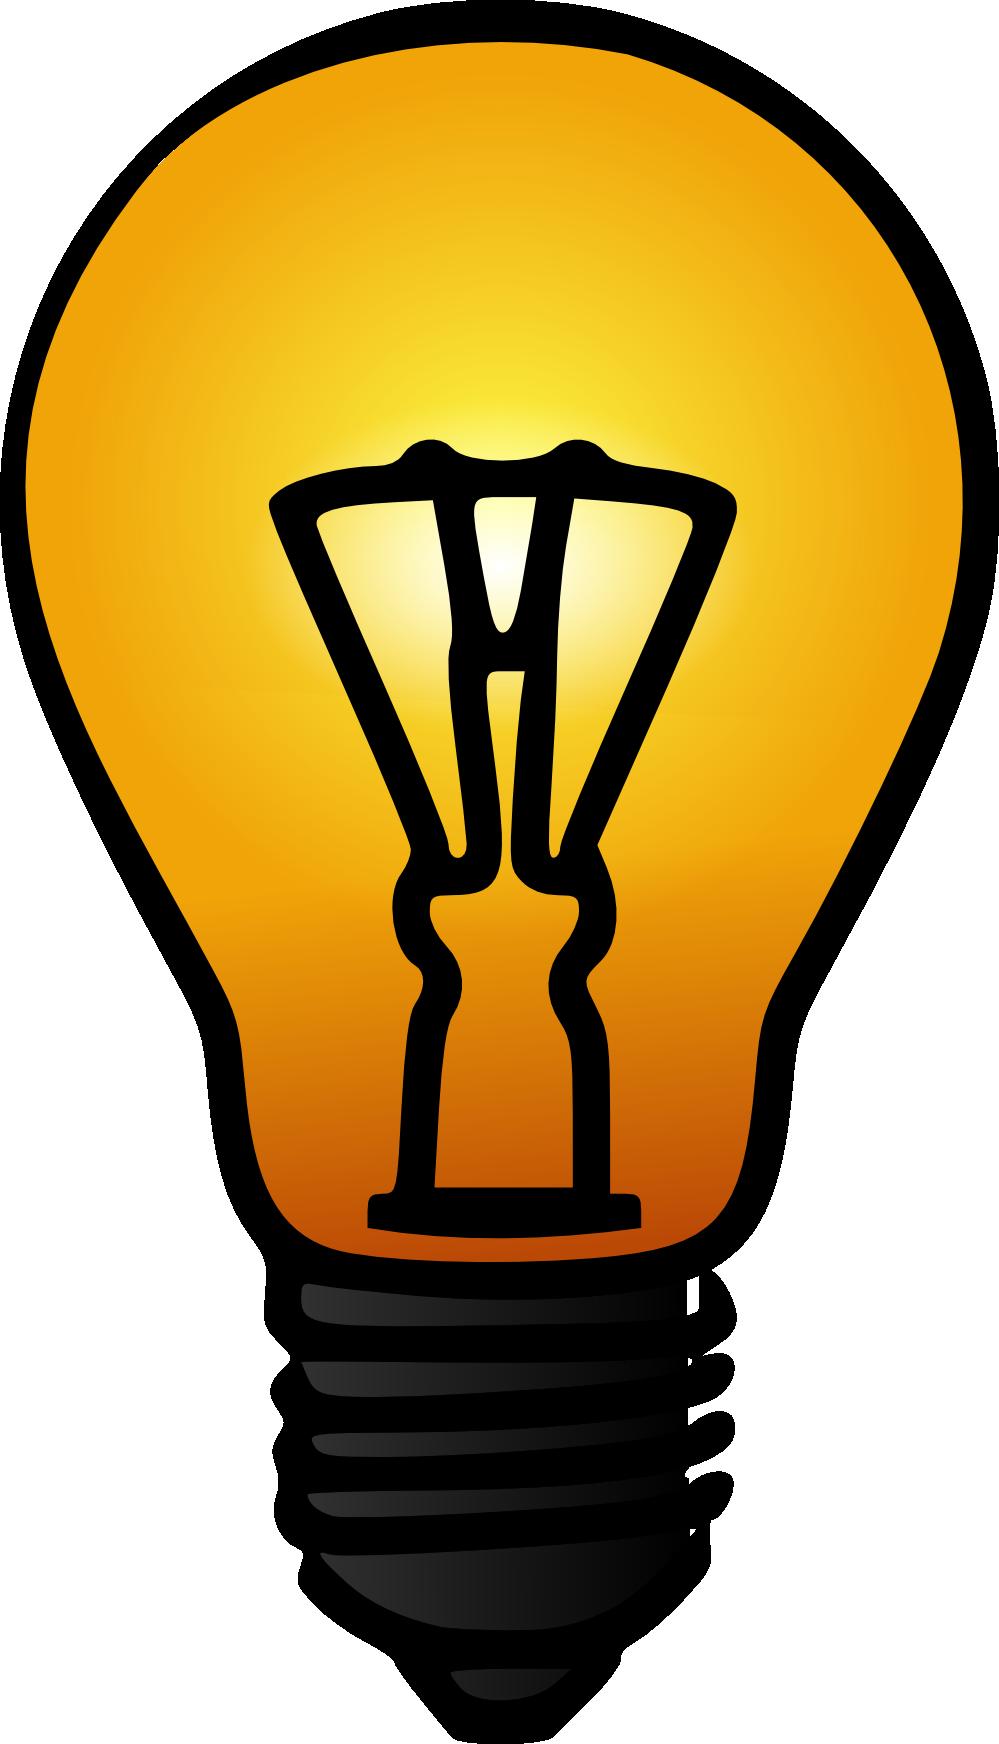 Hypothesis clipart. Bulb